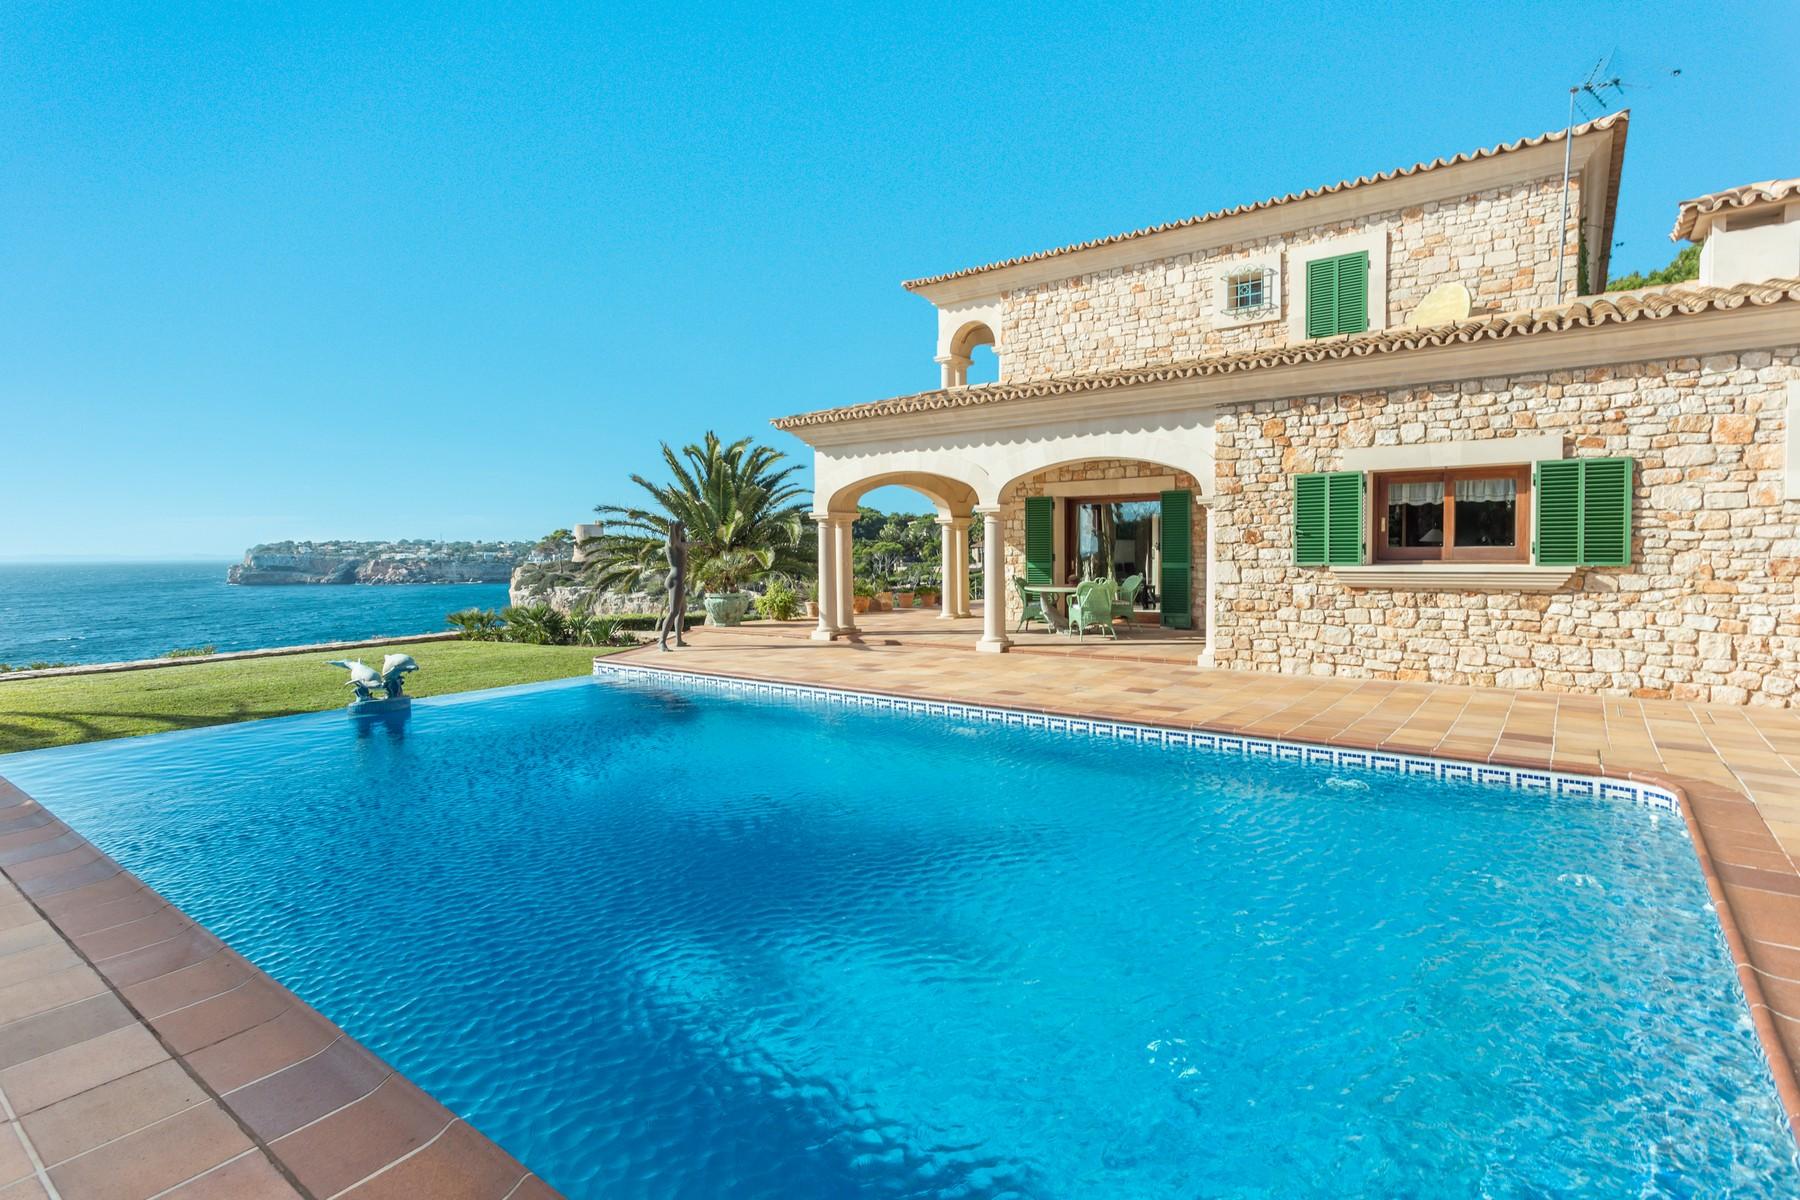 Moradia para Venda às Exclusive frontline villa in Santanyí Santanyi, Palma De Maiorca, 07171 Espanha